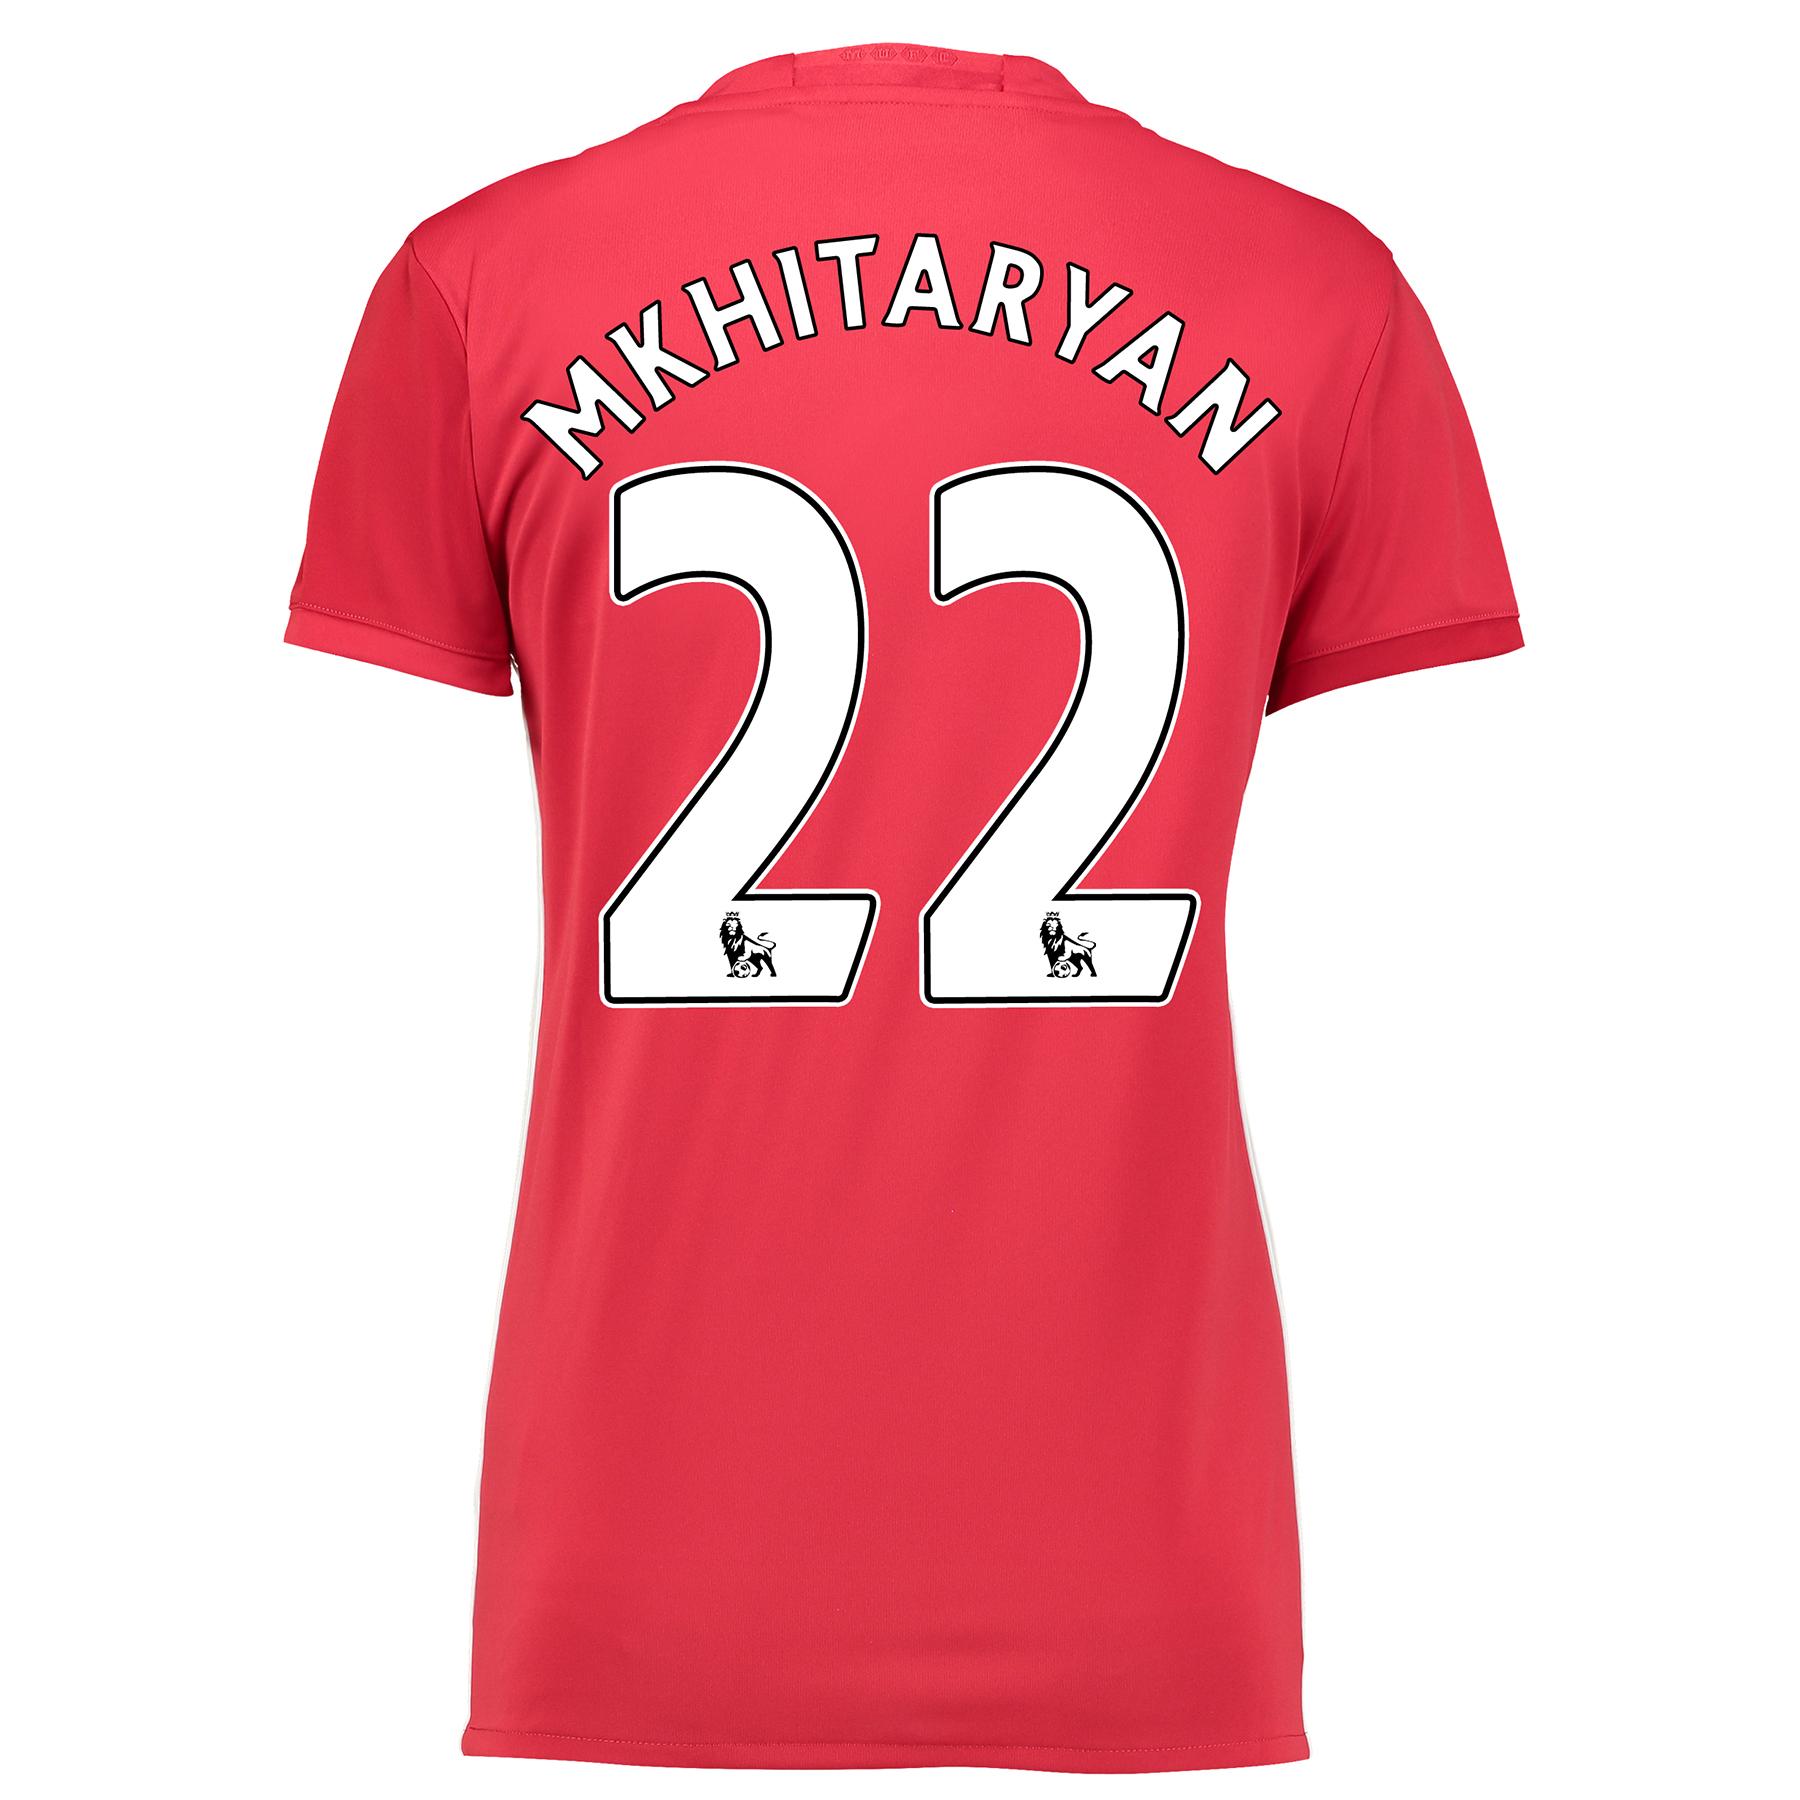 Manchester United Home Shirt 2016-17 - Womens with Mkhitaryan 22 print